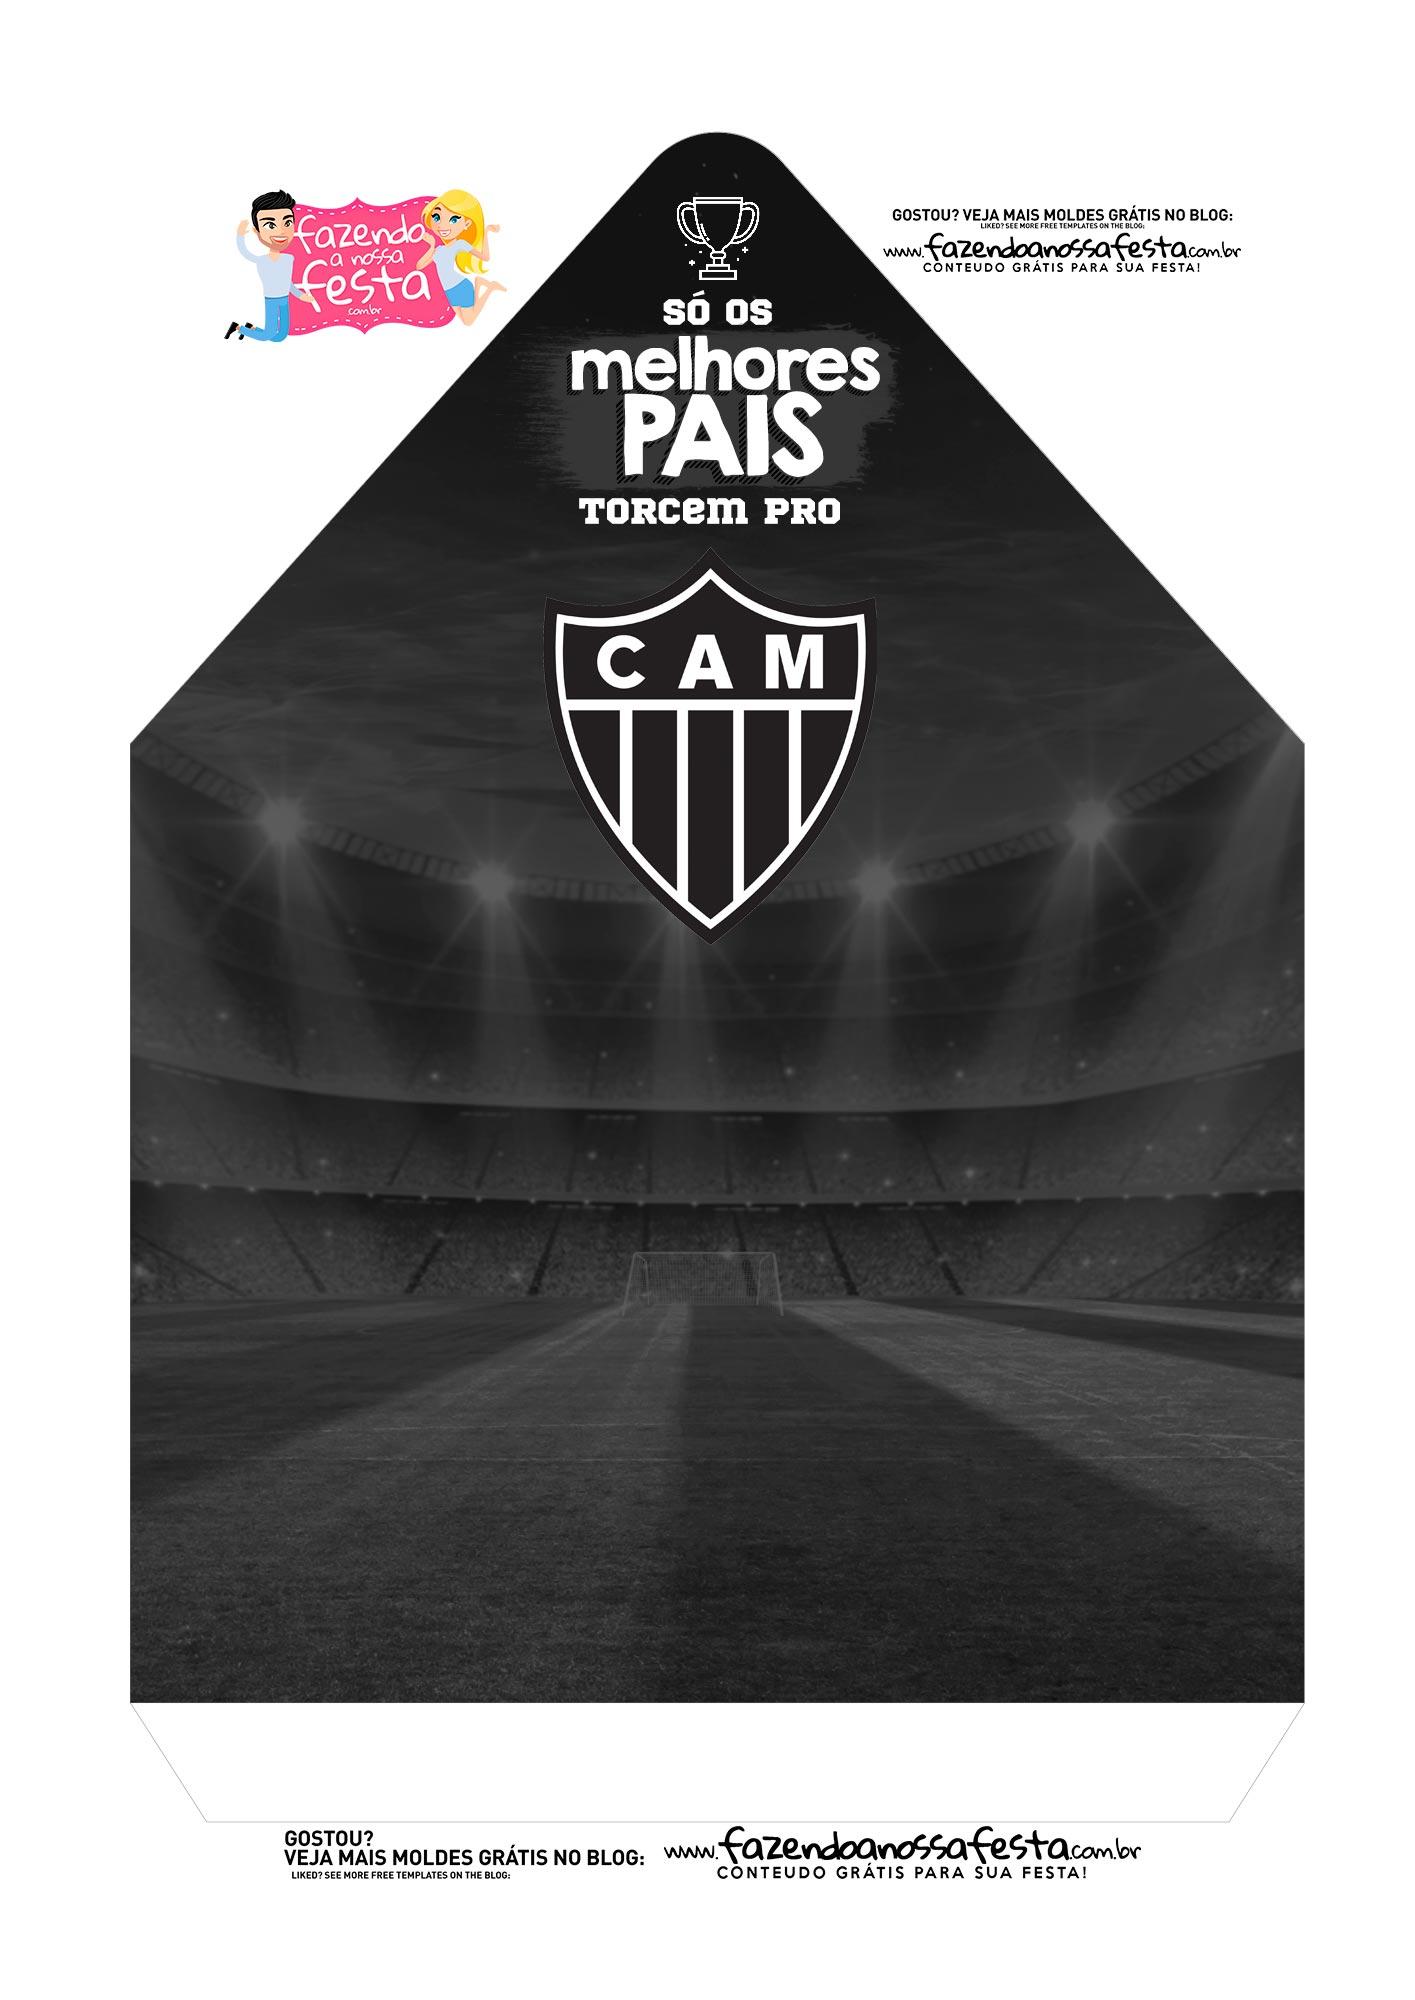 Caixa Envelope Atletico MG 2